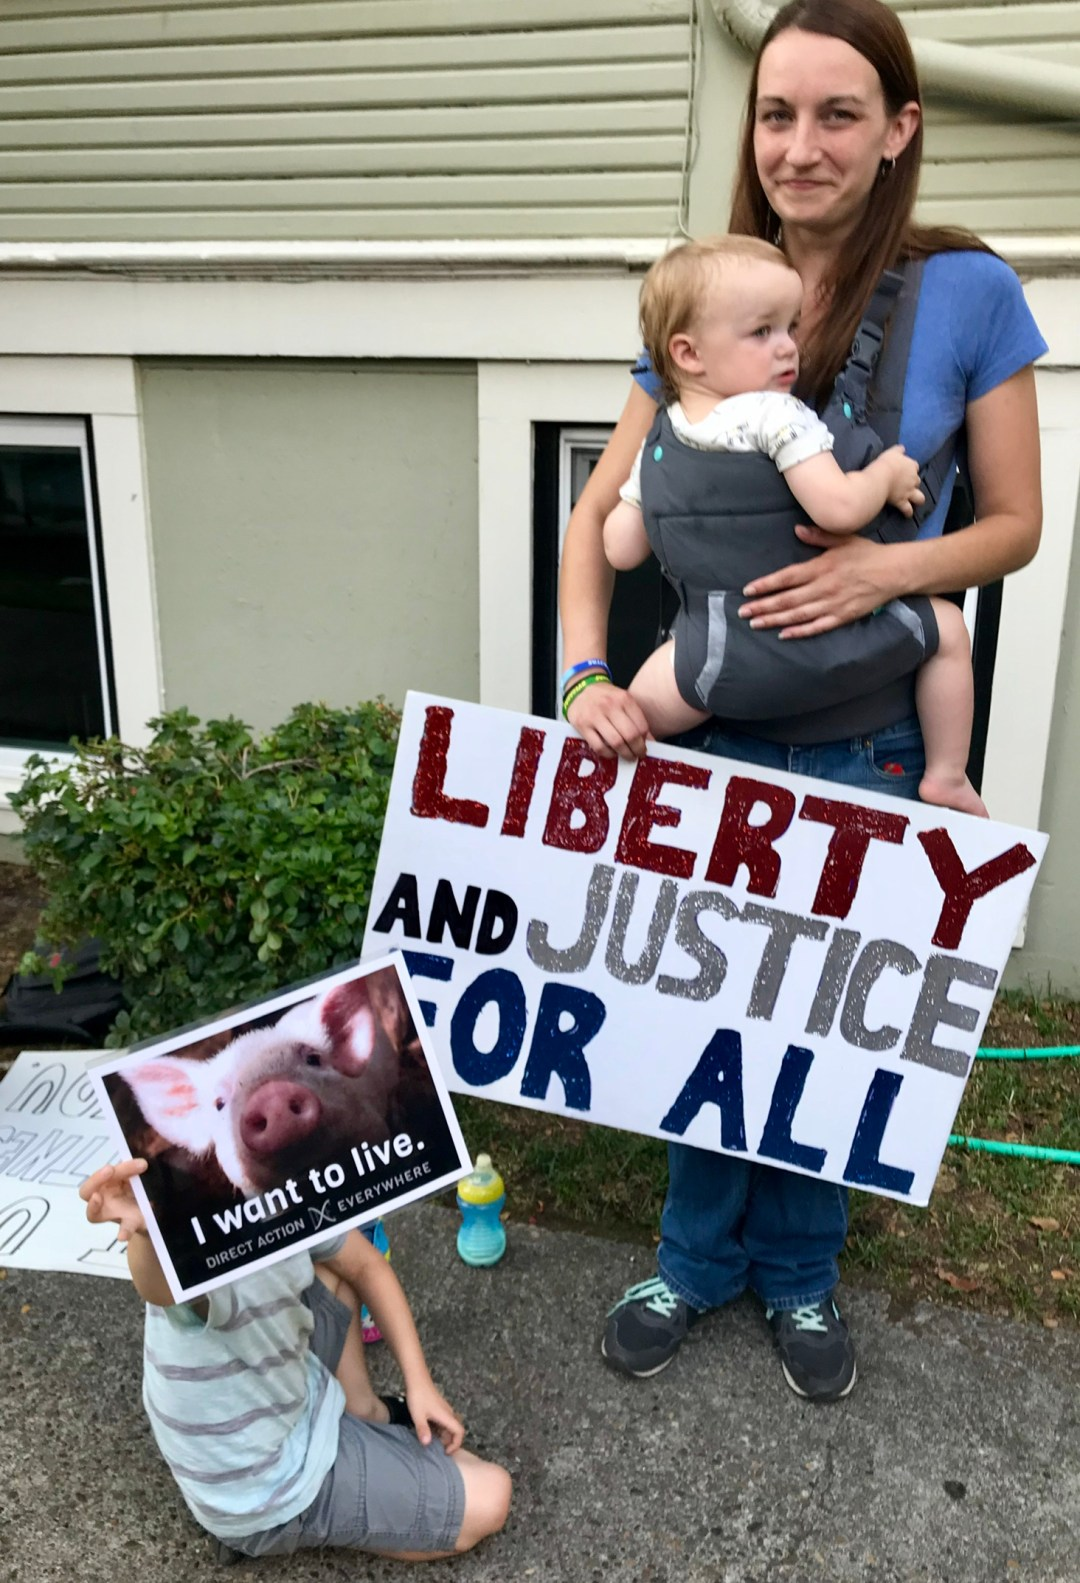 High on a Hog pig roast happy pigs piglet liberty justice vegan kids